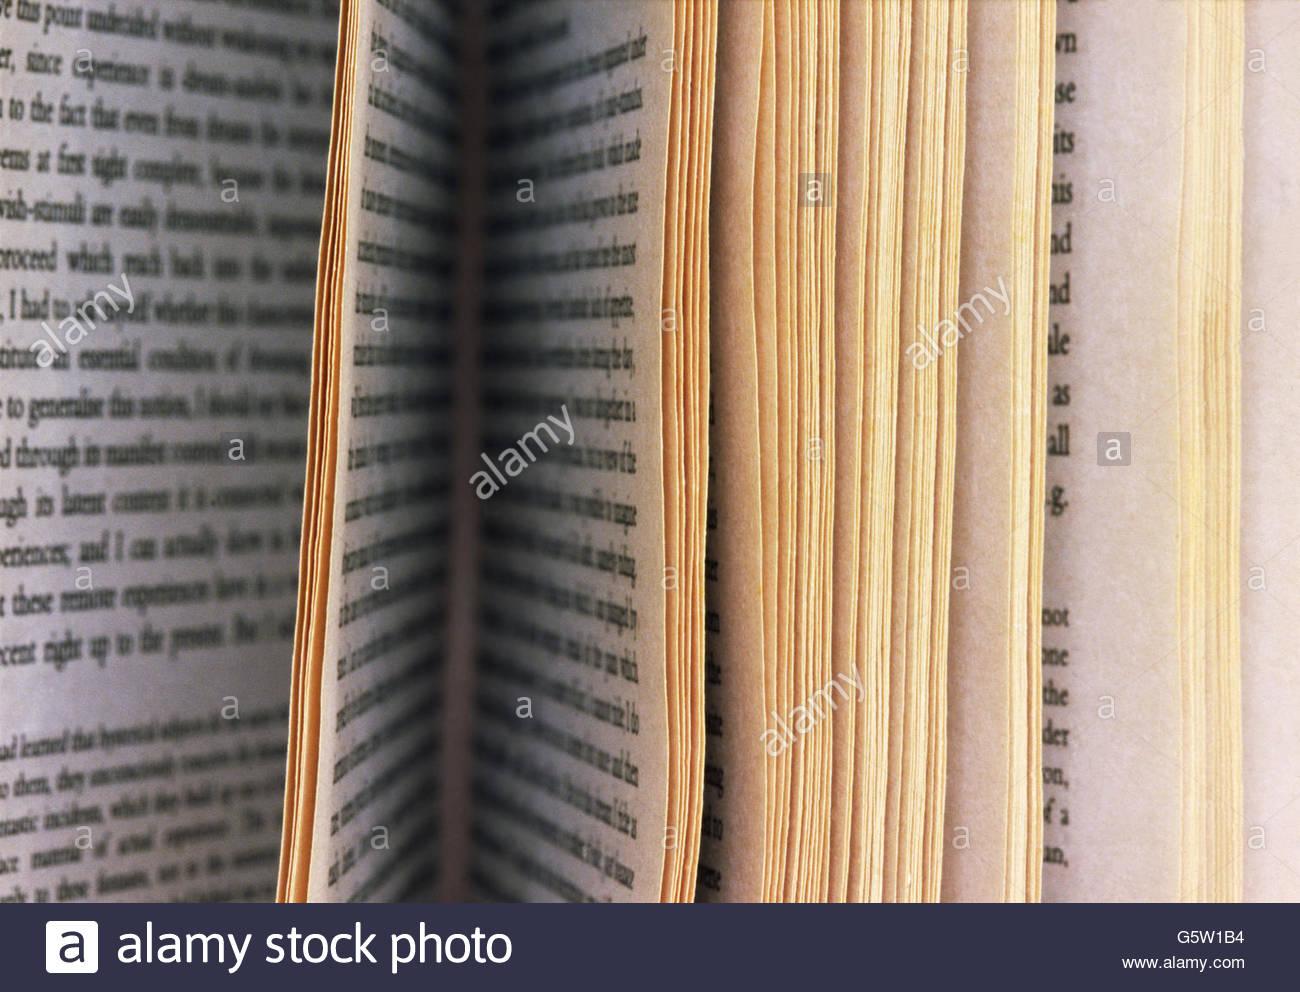 Buch Seite Detail Stockbild